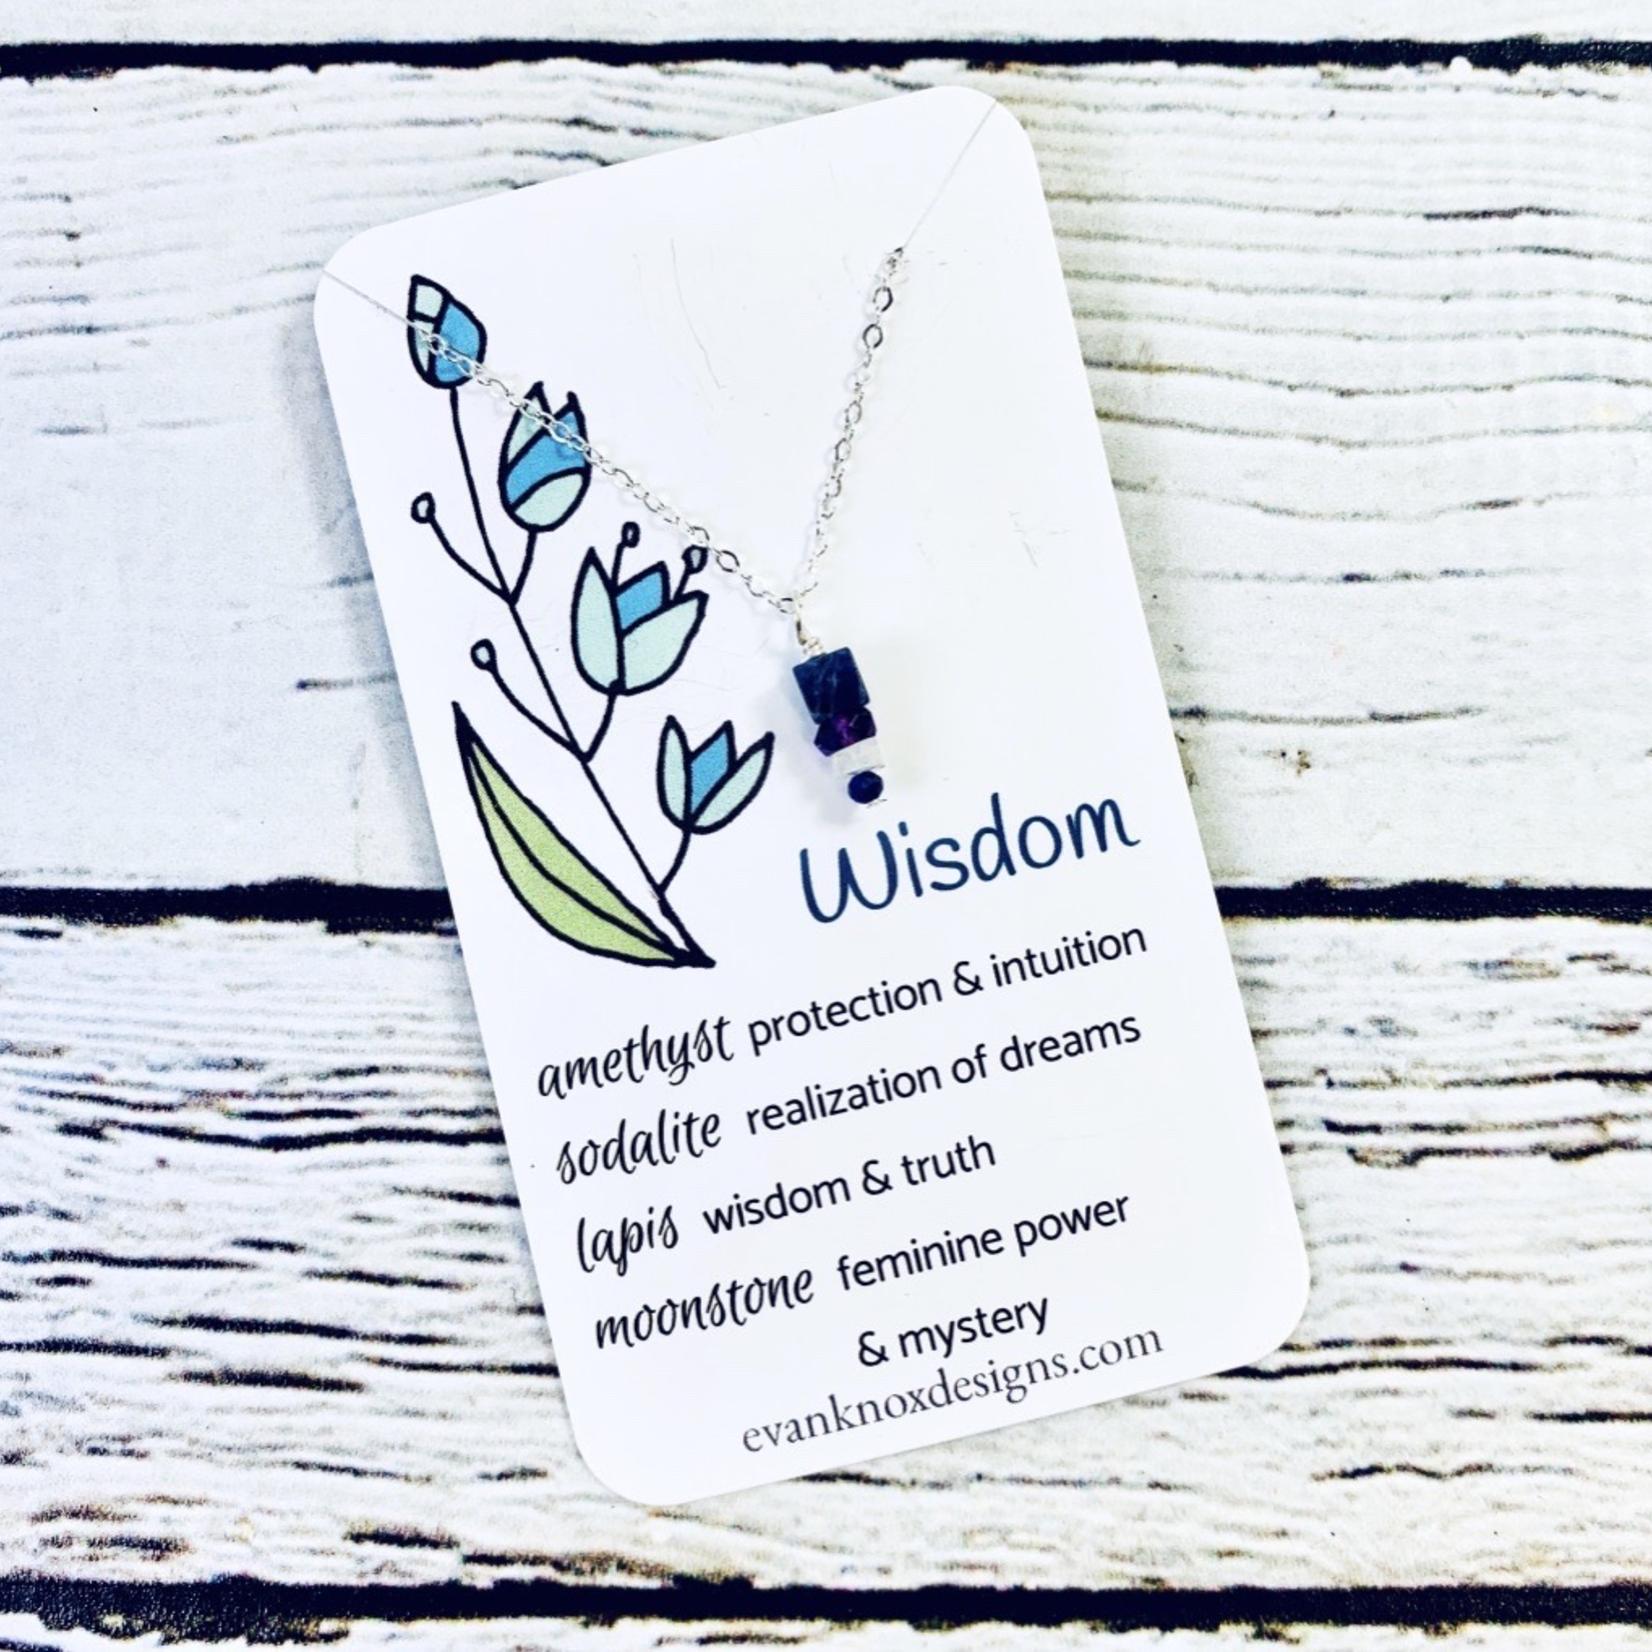 Handmade Silver Necklace with wisdom gemstones